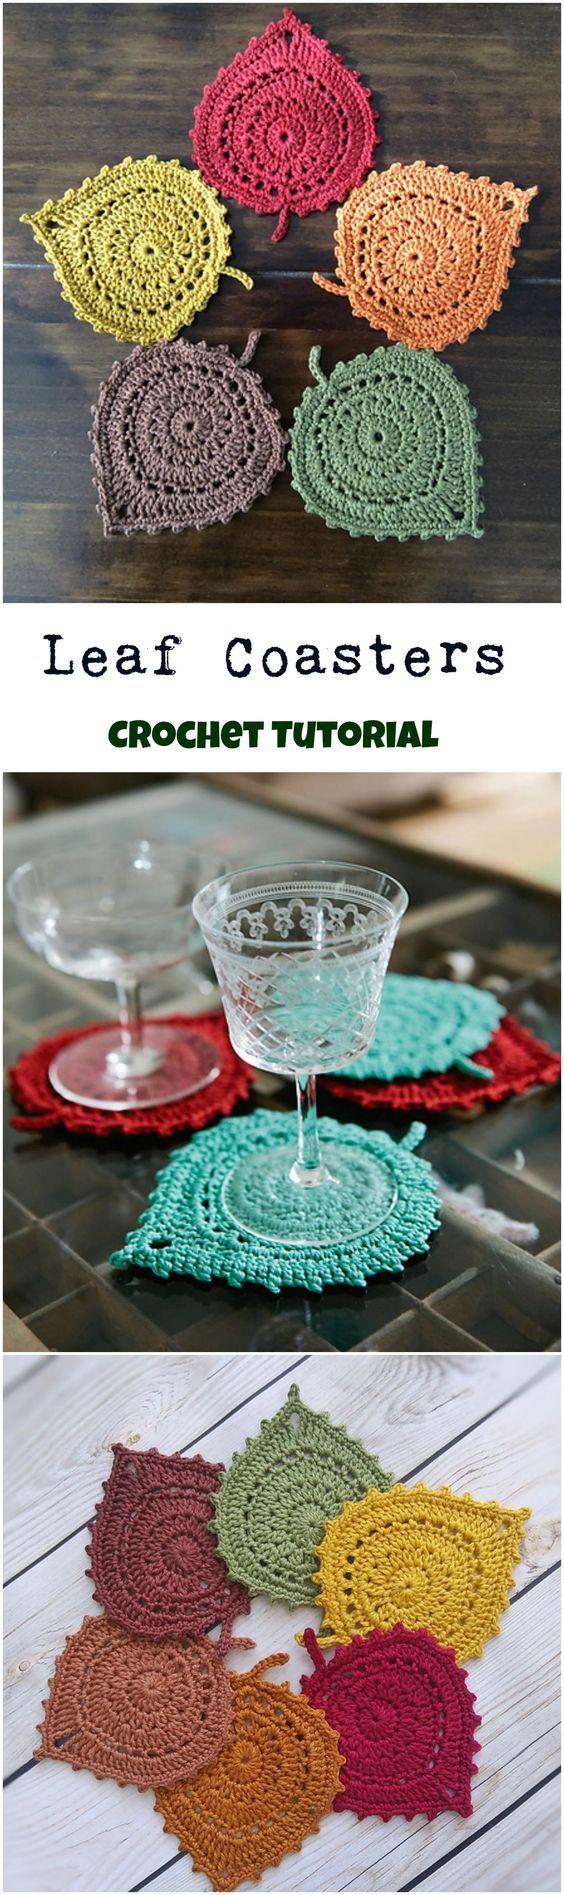 crochet leaf coasters